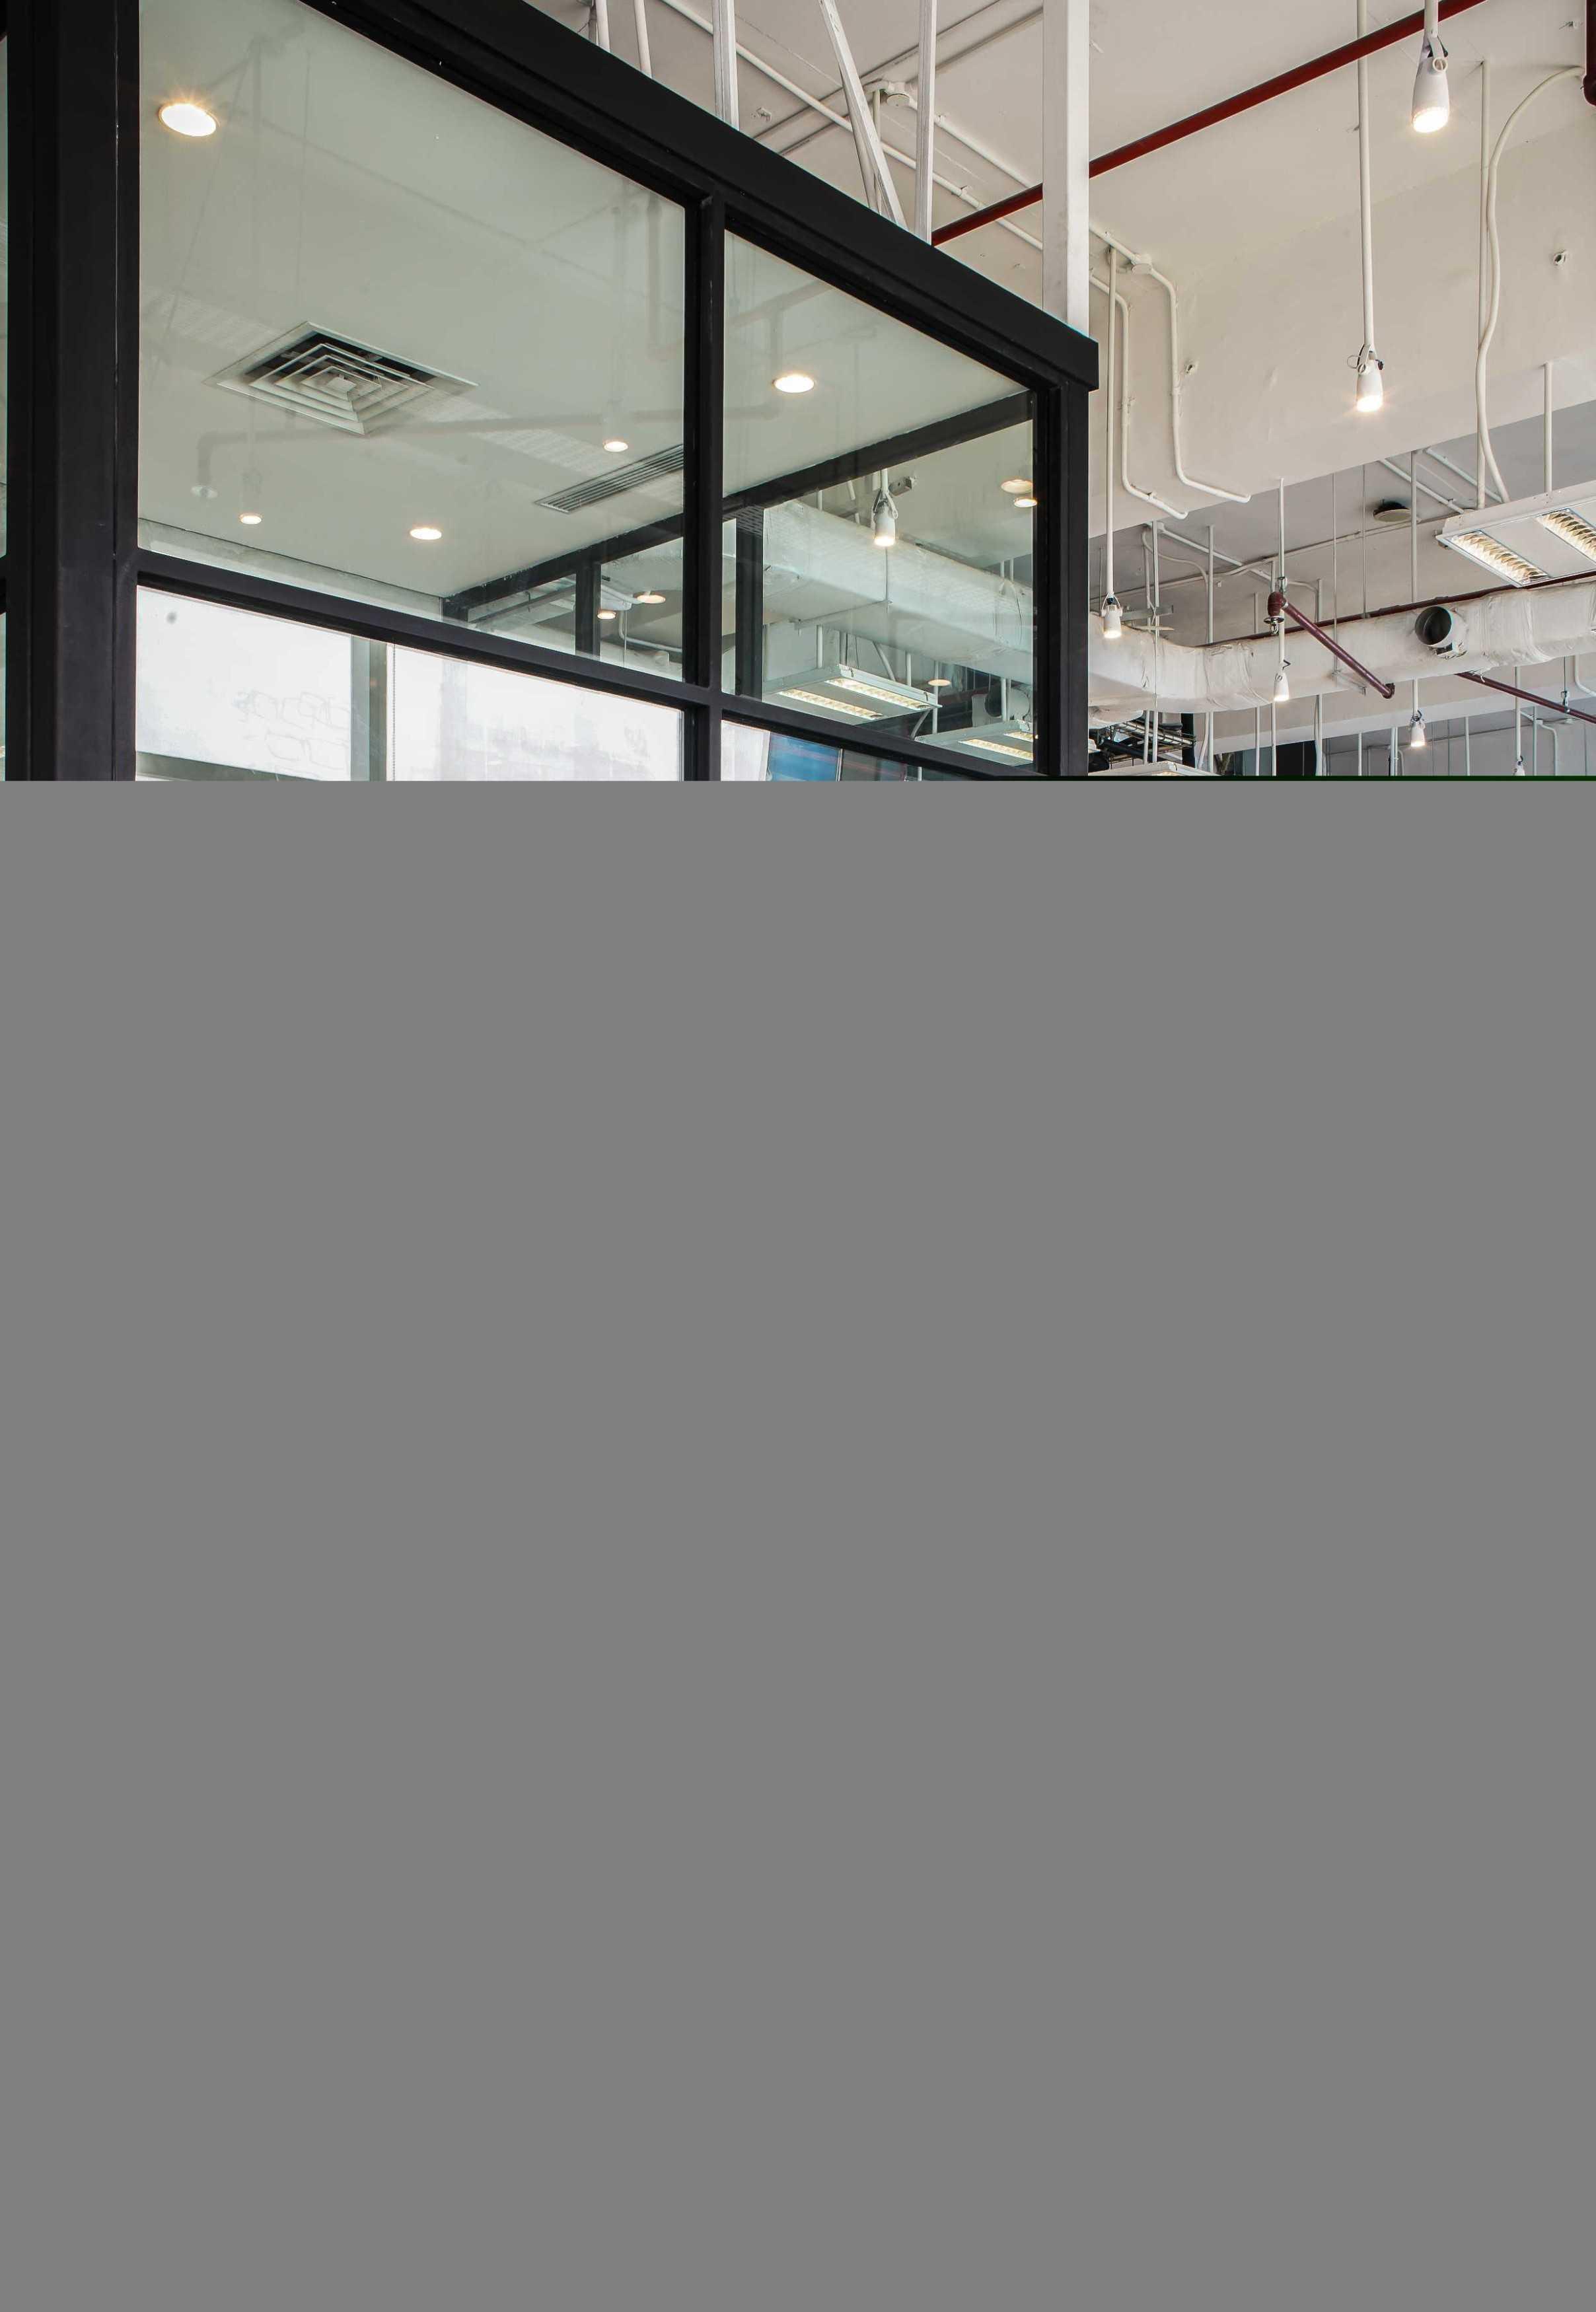 Design Intervention Tech Company Floor 19 Jakarta, Daerah Khusus Ibukota Jakarta, Indonesia Jakarta, Daerah Khusus Ibukota Jakarta, Indonesia Design-Intervention-Traveloka-19Th-Floor   71030